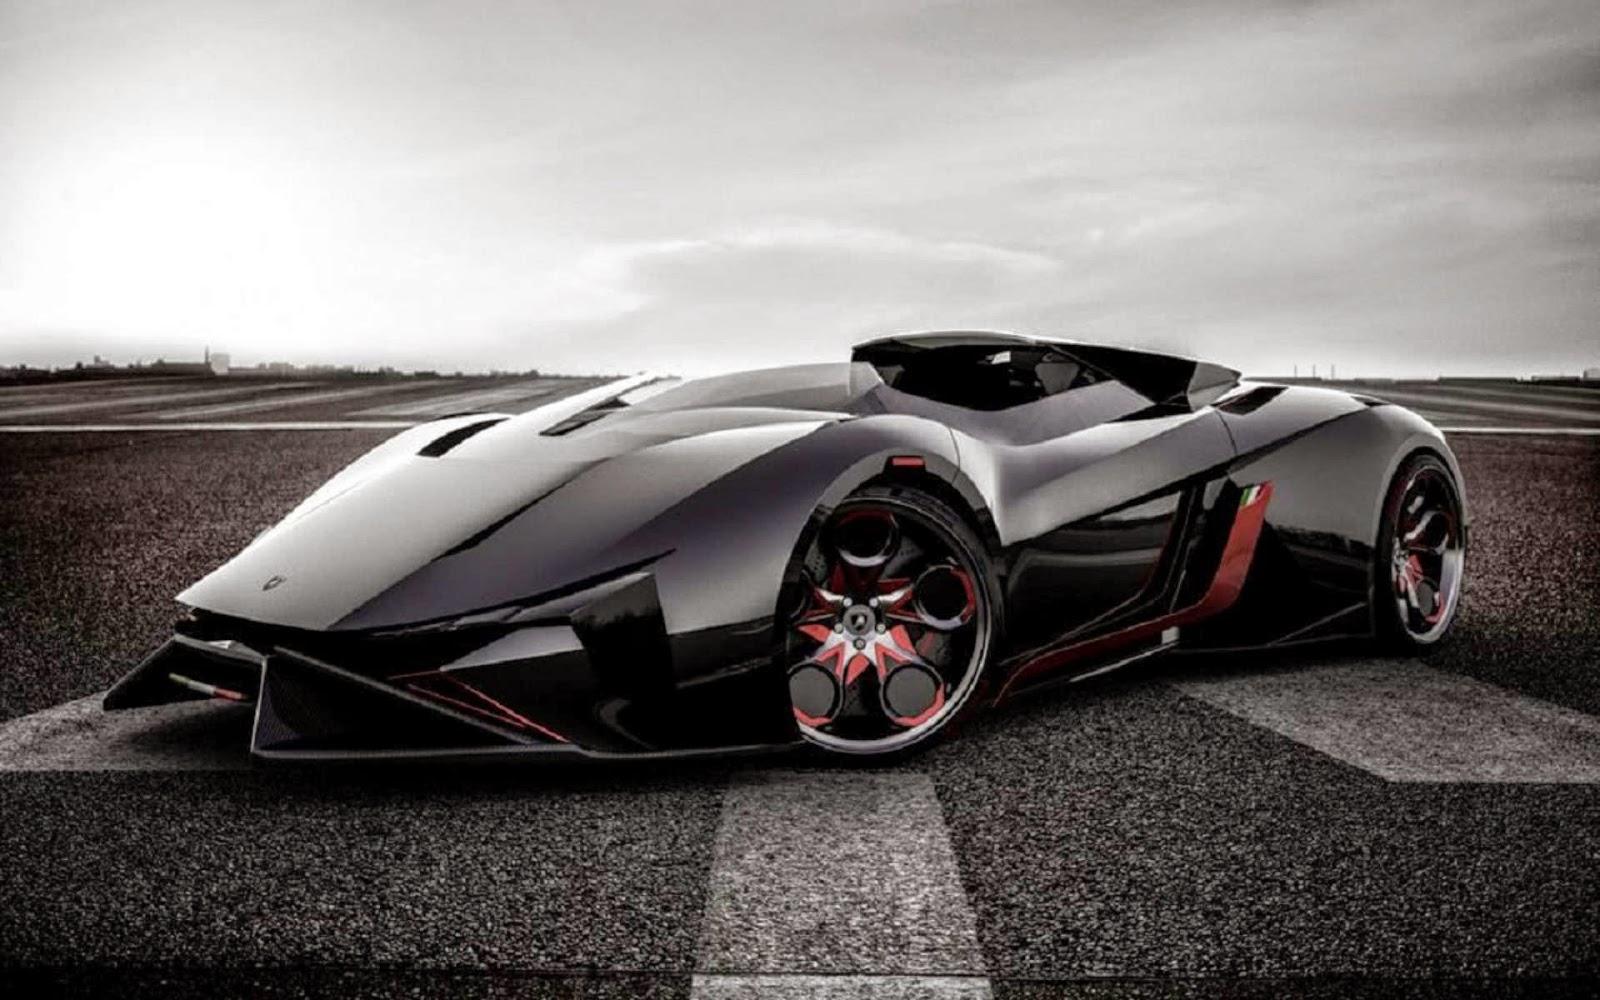 Future lamborghini cars hd wallpapers o wallpaper - Future cars hd wallpapers ...